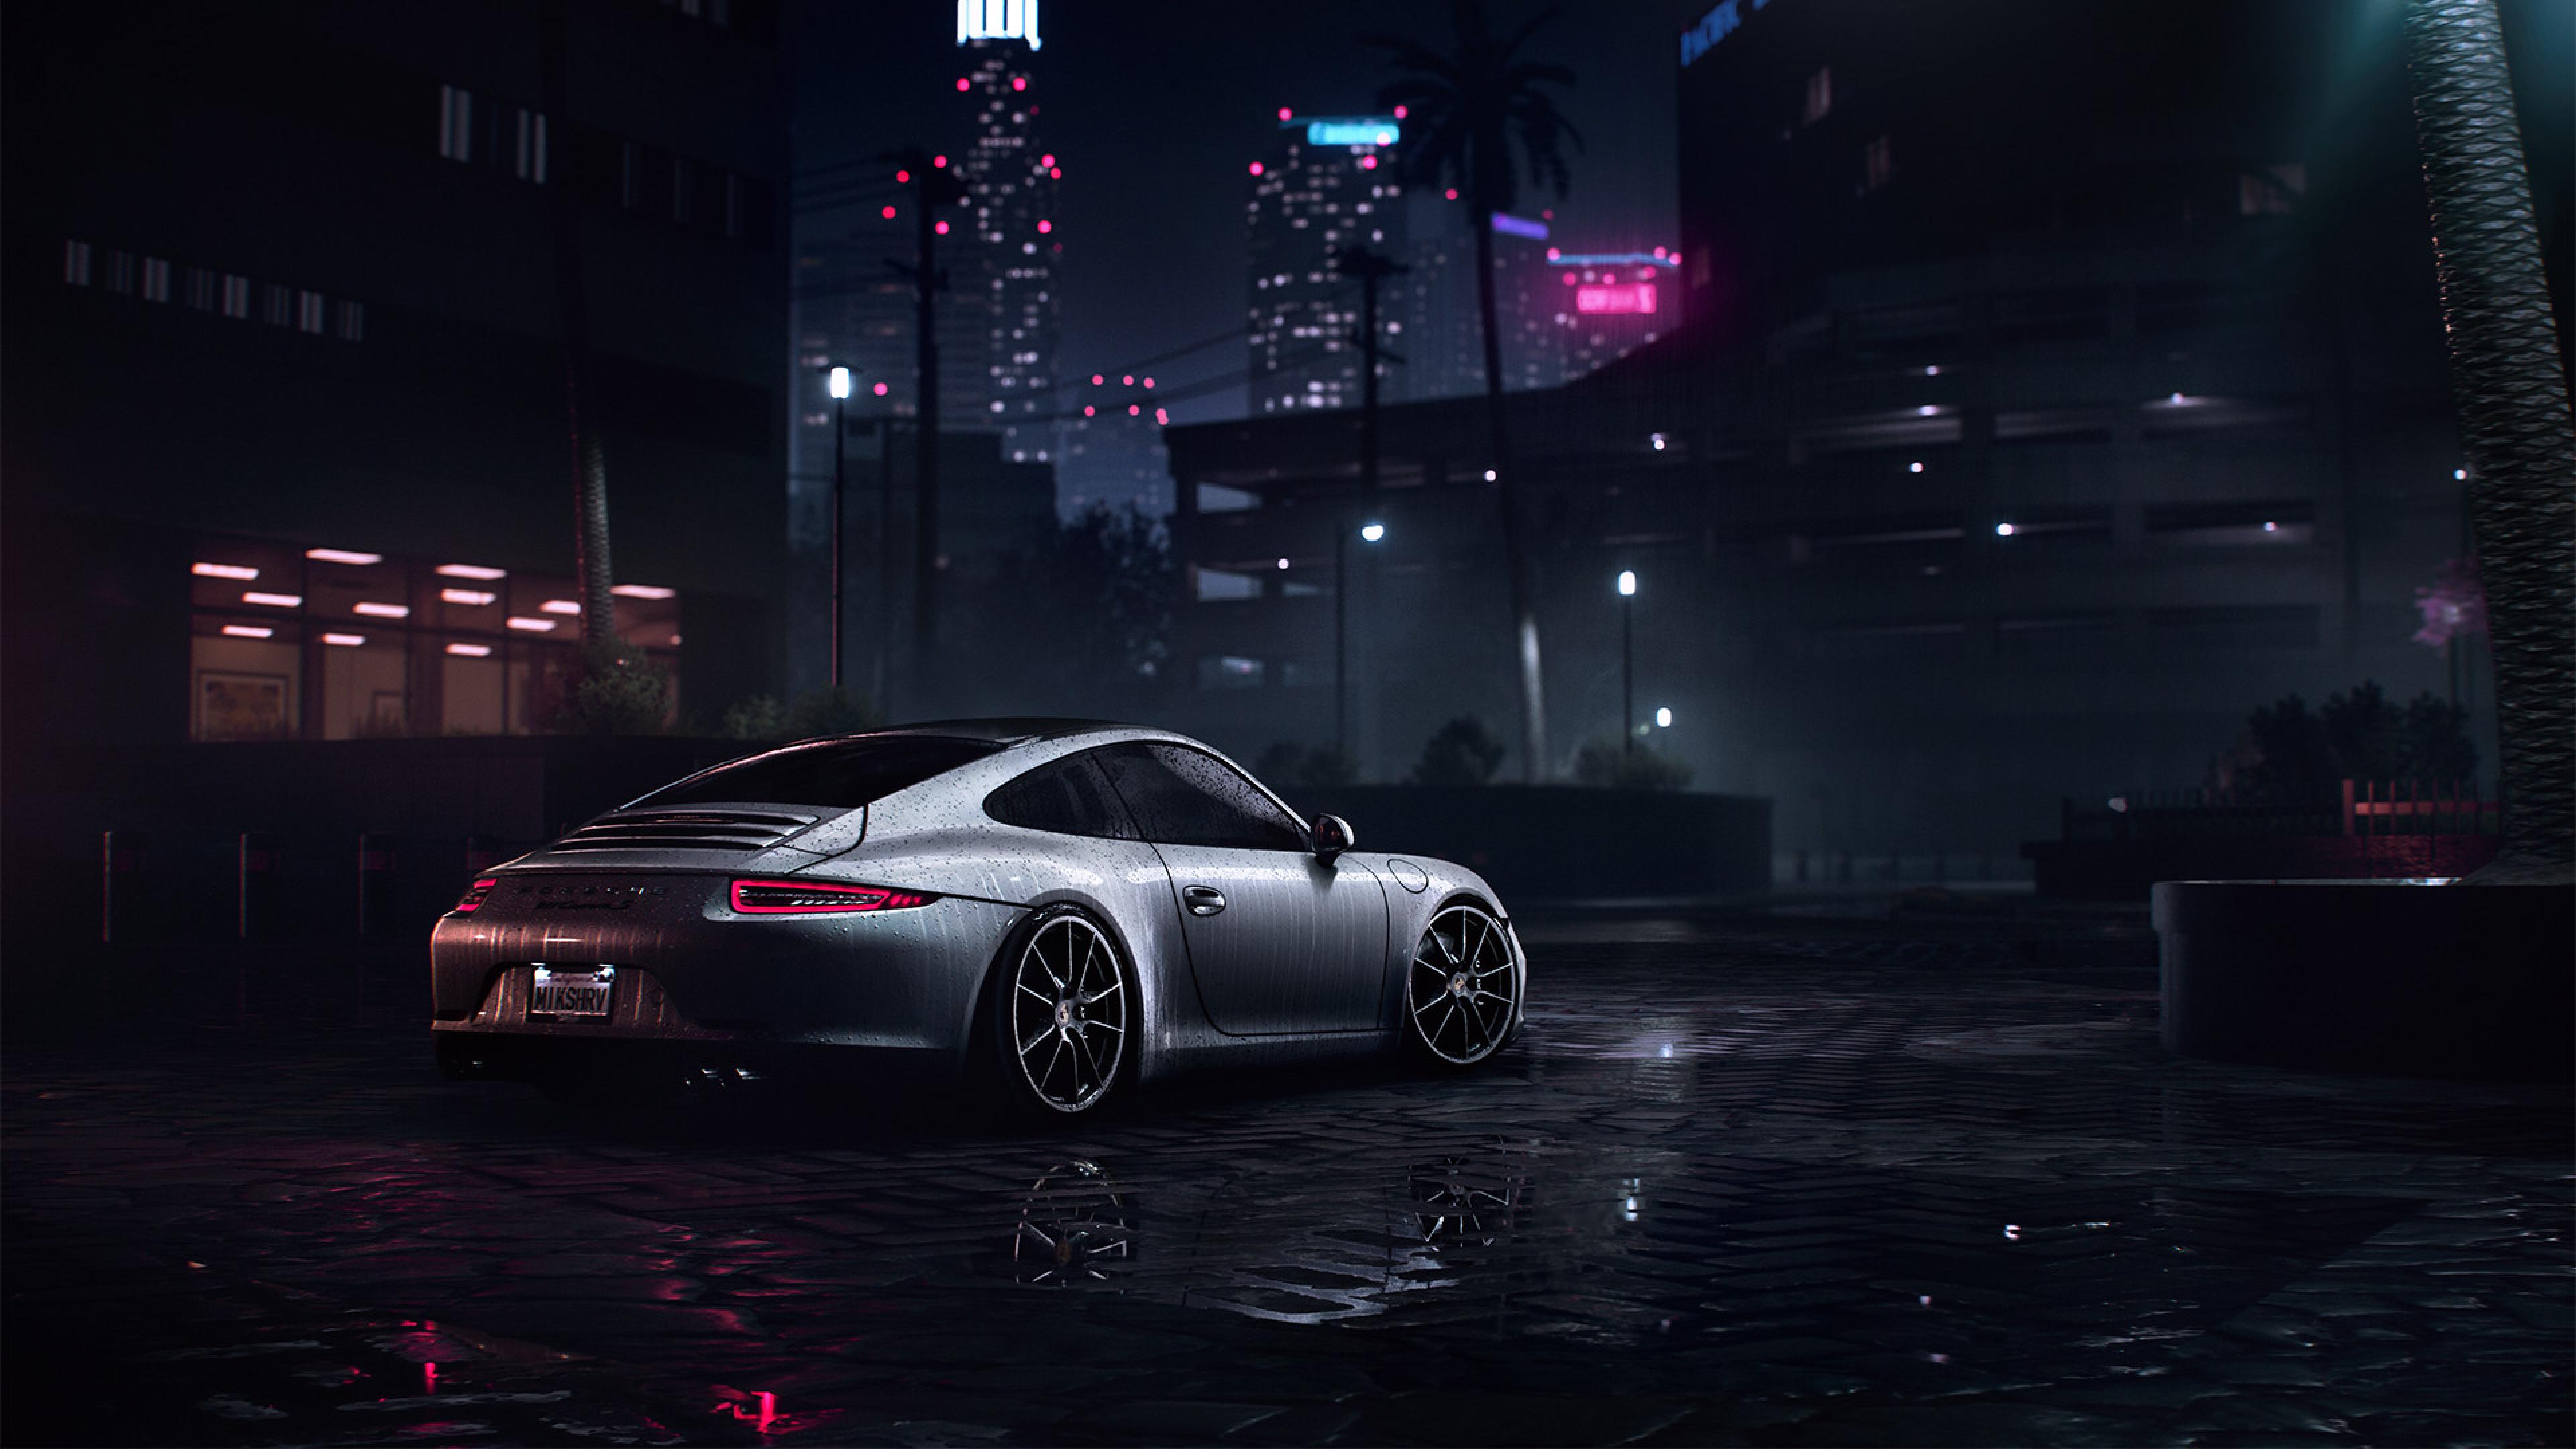 3840x2160 Porsche 911 Carrera S Need For Speed 4k Wallpaper Hd